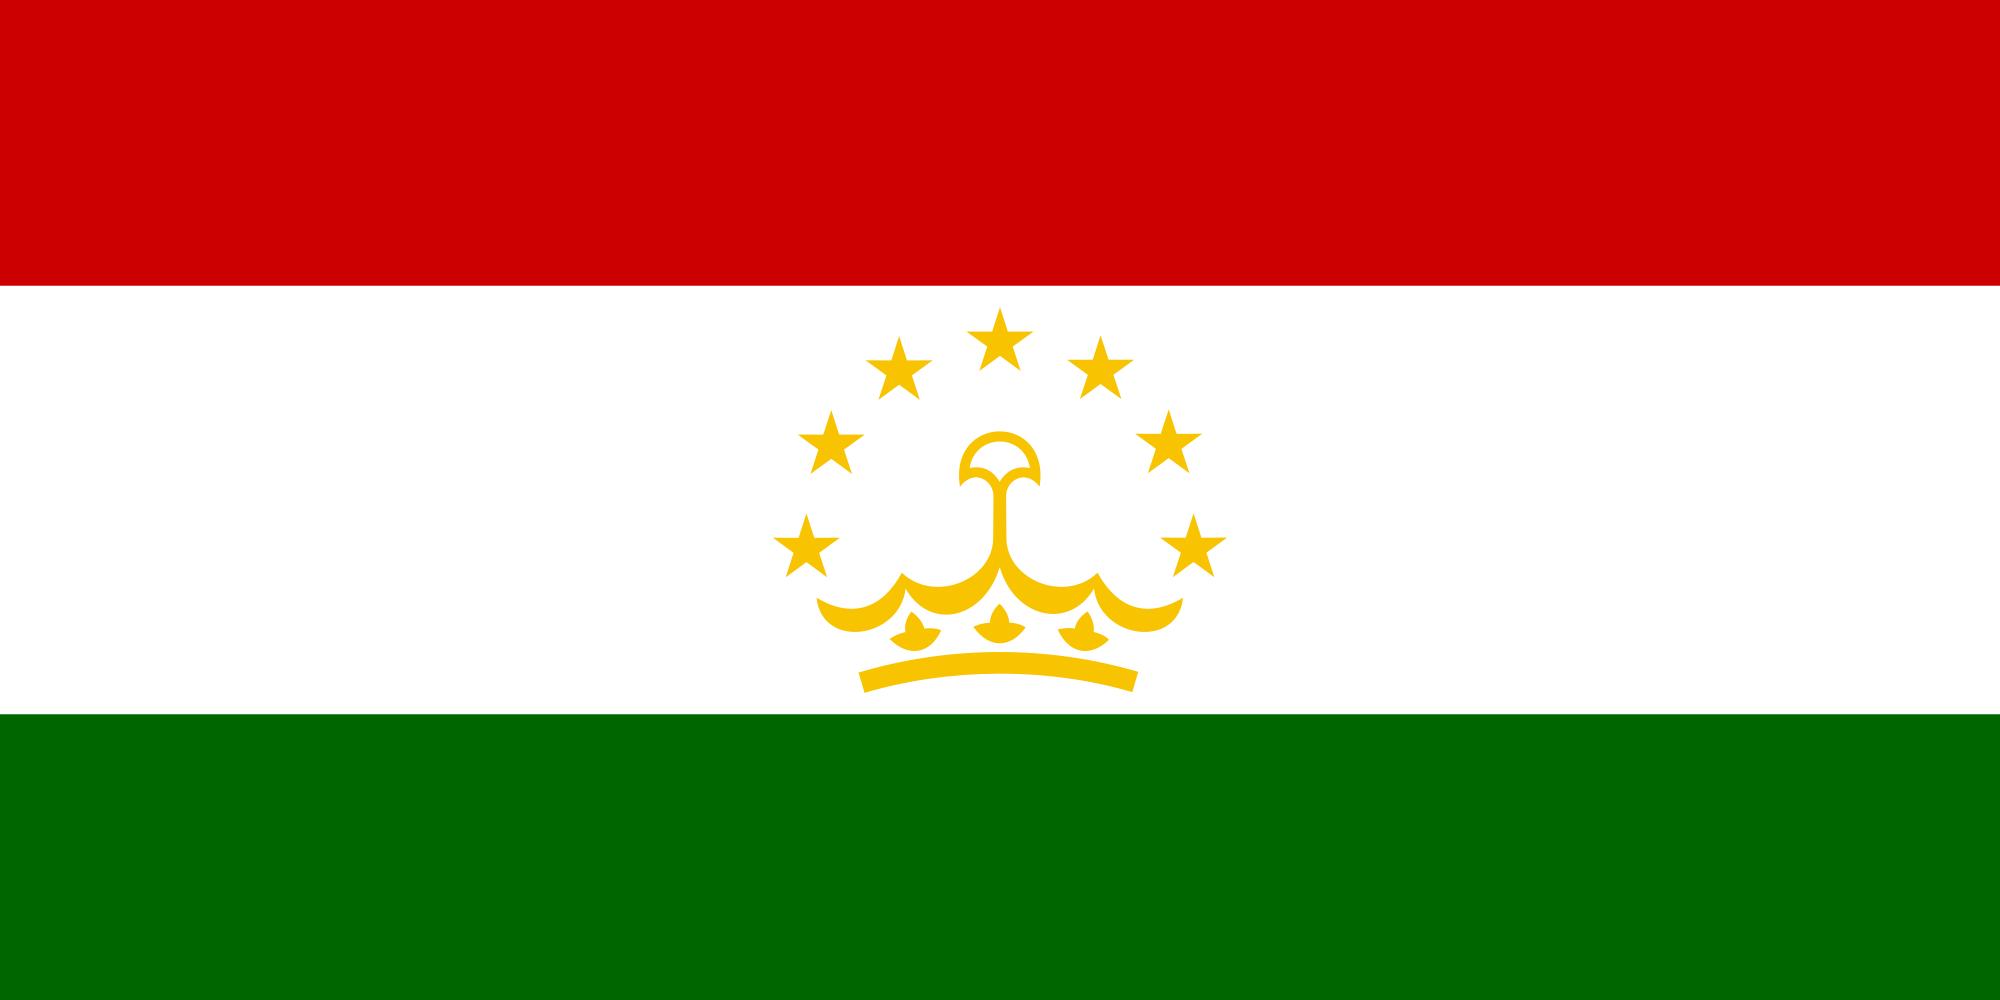 Флаг Таджикистана фото анимационный